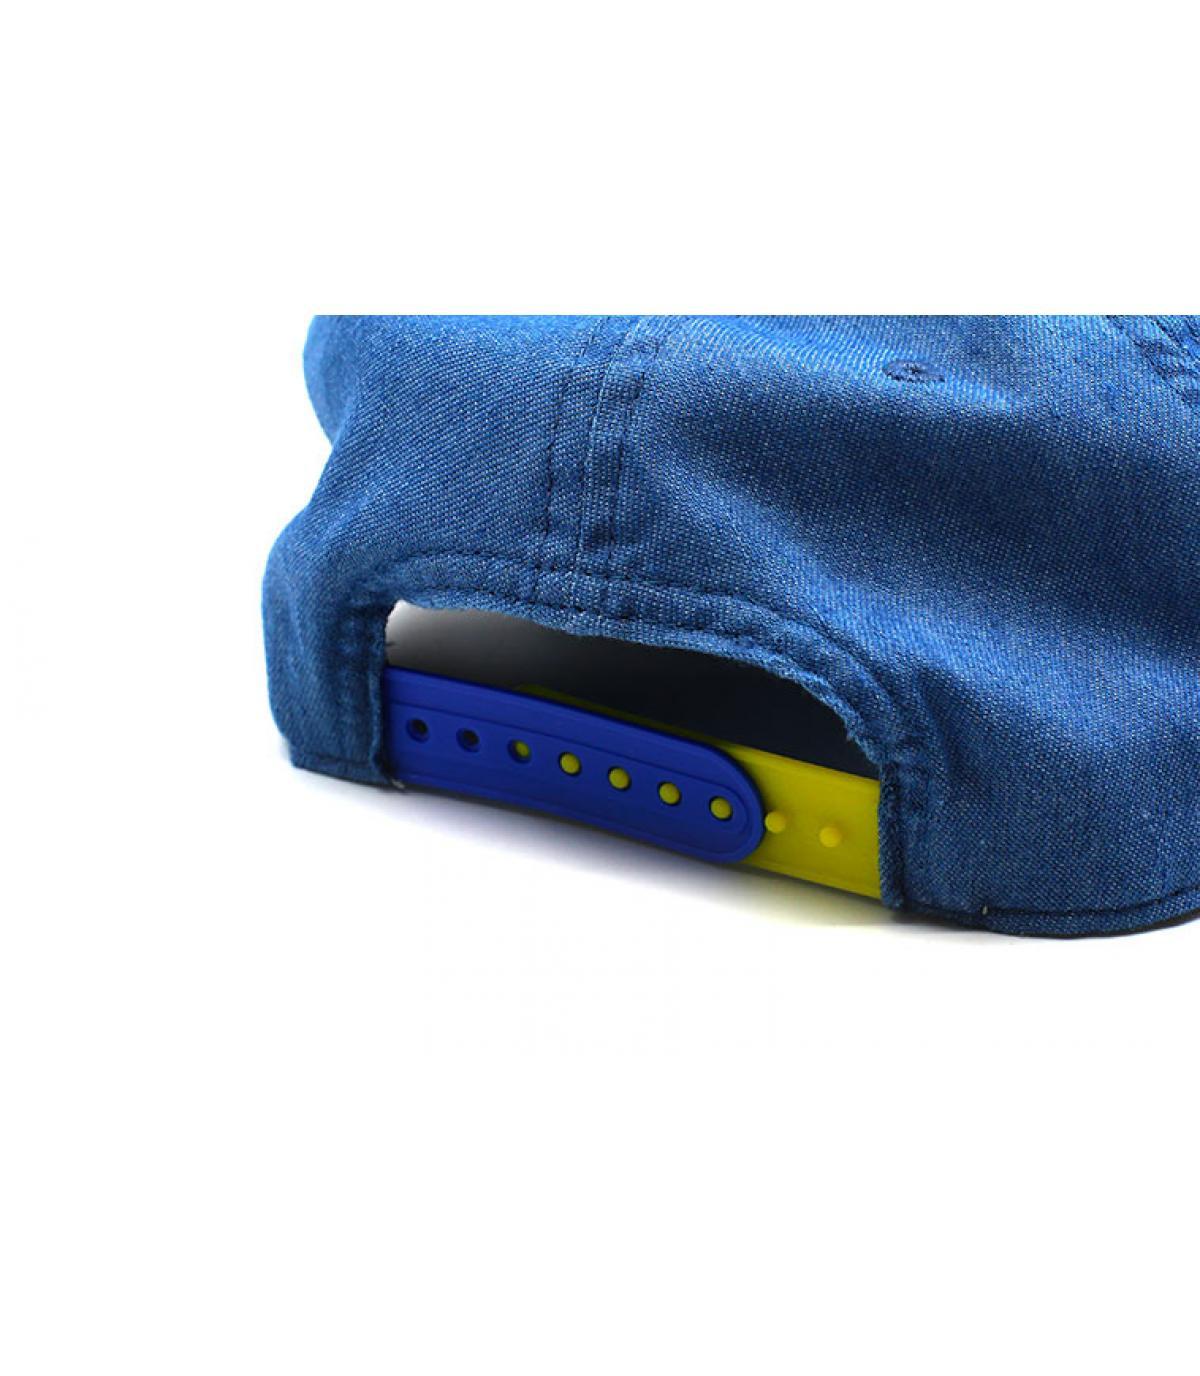 Details Conquest blue - Abbildung 5